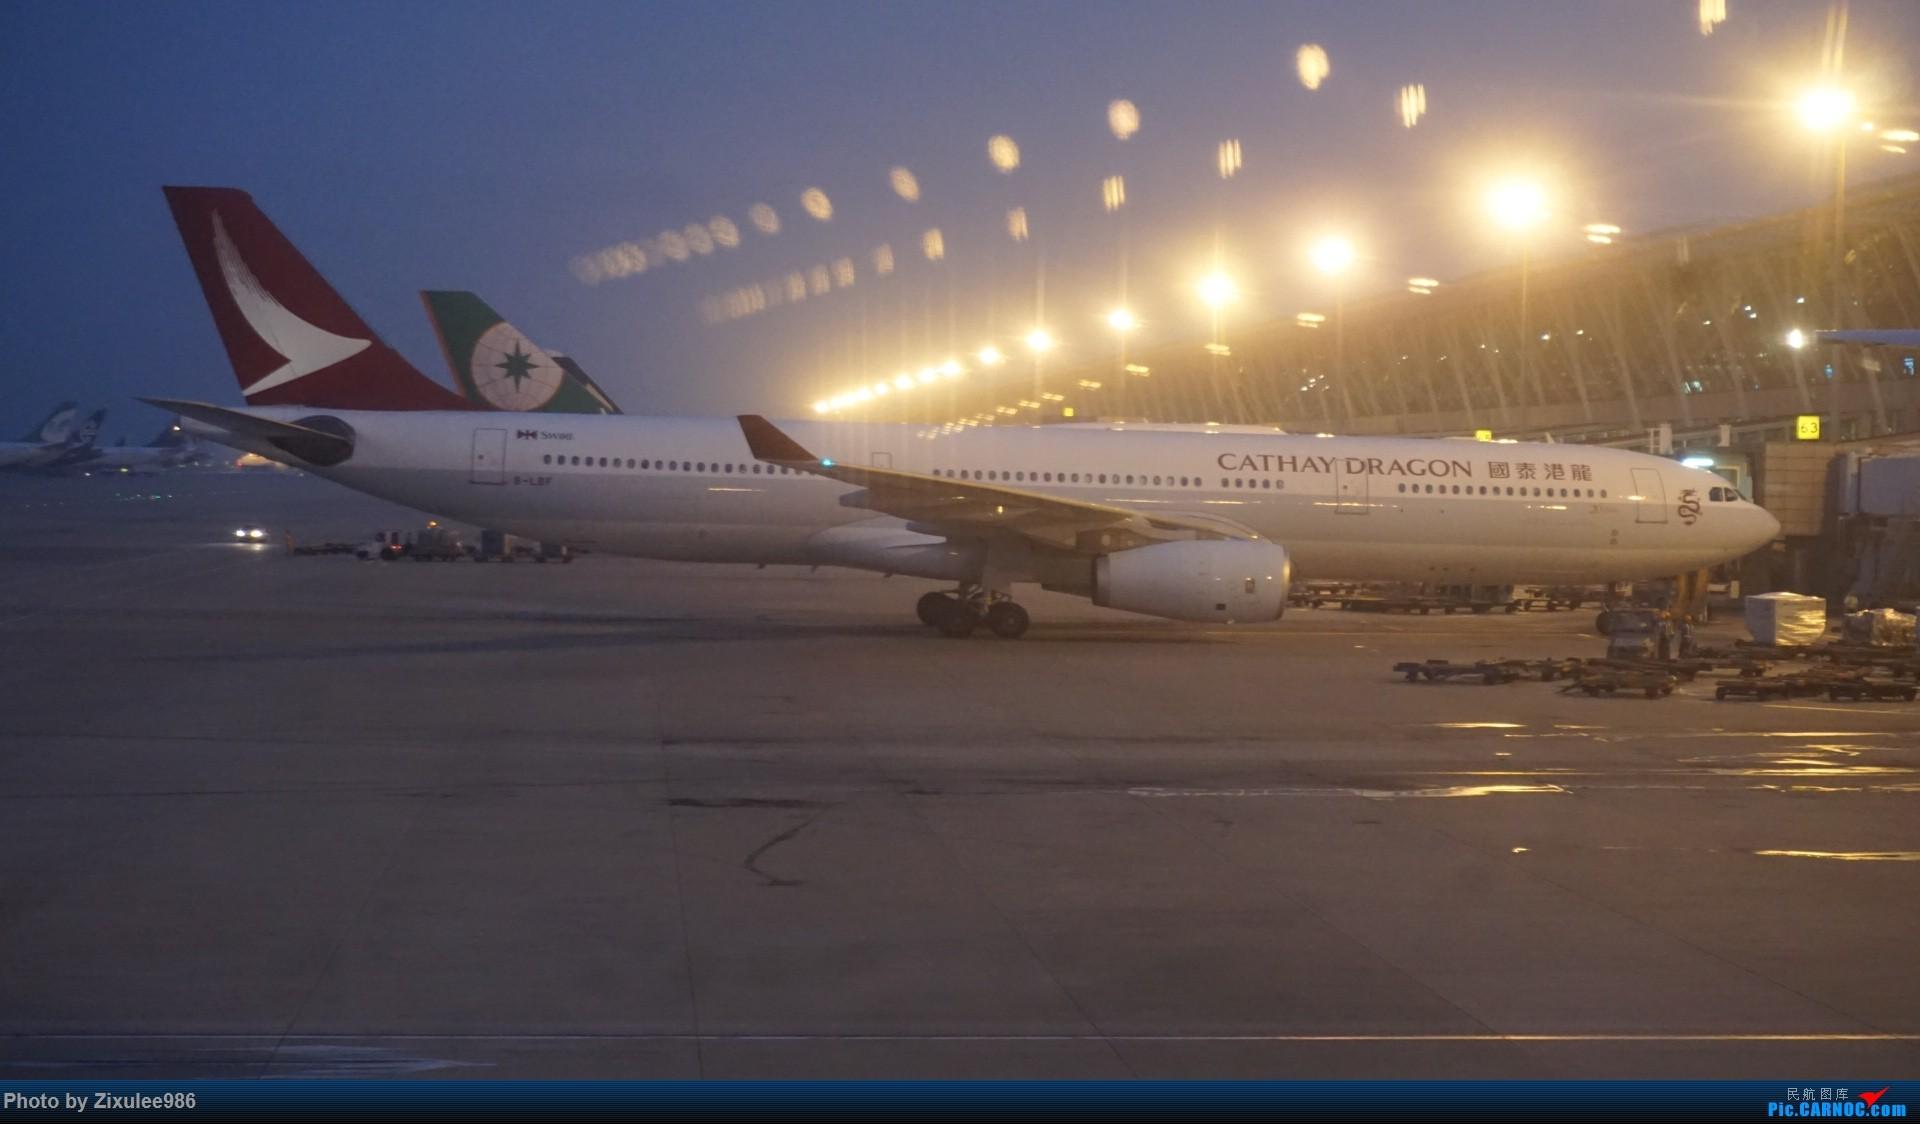 Re:[原创]加拿大21日游学之旅 (二)~加航AC28..PVG-YYZ到达多村后的雨天~多图缓更,请各位大侠谅解~ AIRBUS A330-343X B-LBF 中国上海浦东国际机场